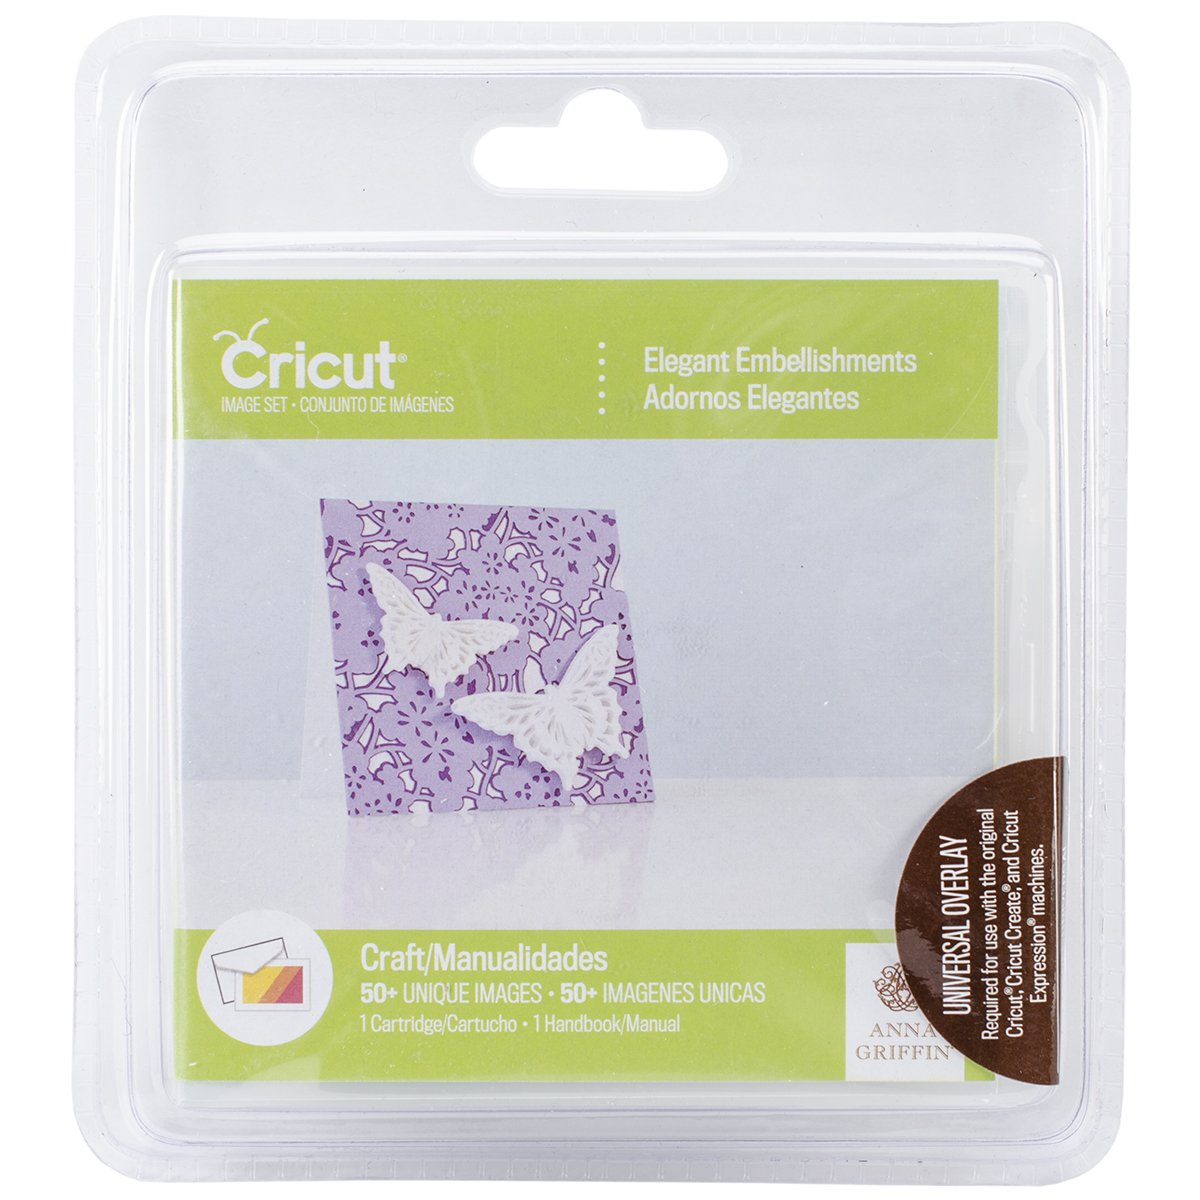 Cricut Elegant Embellishments Cartridge 2002468